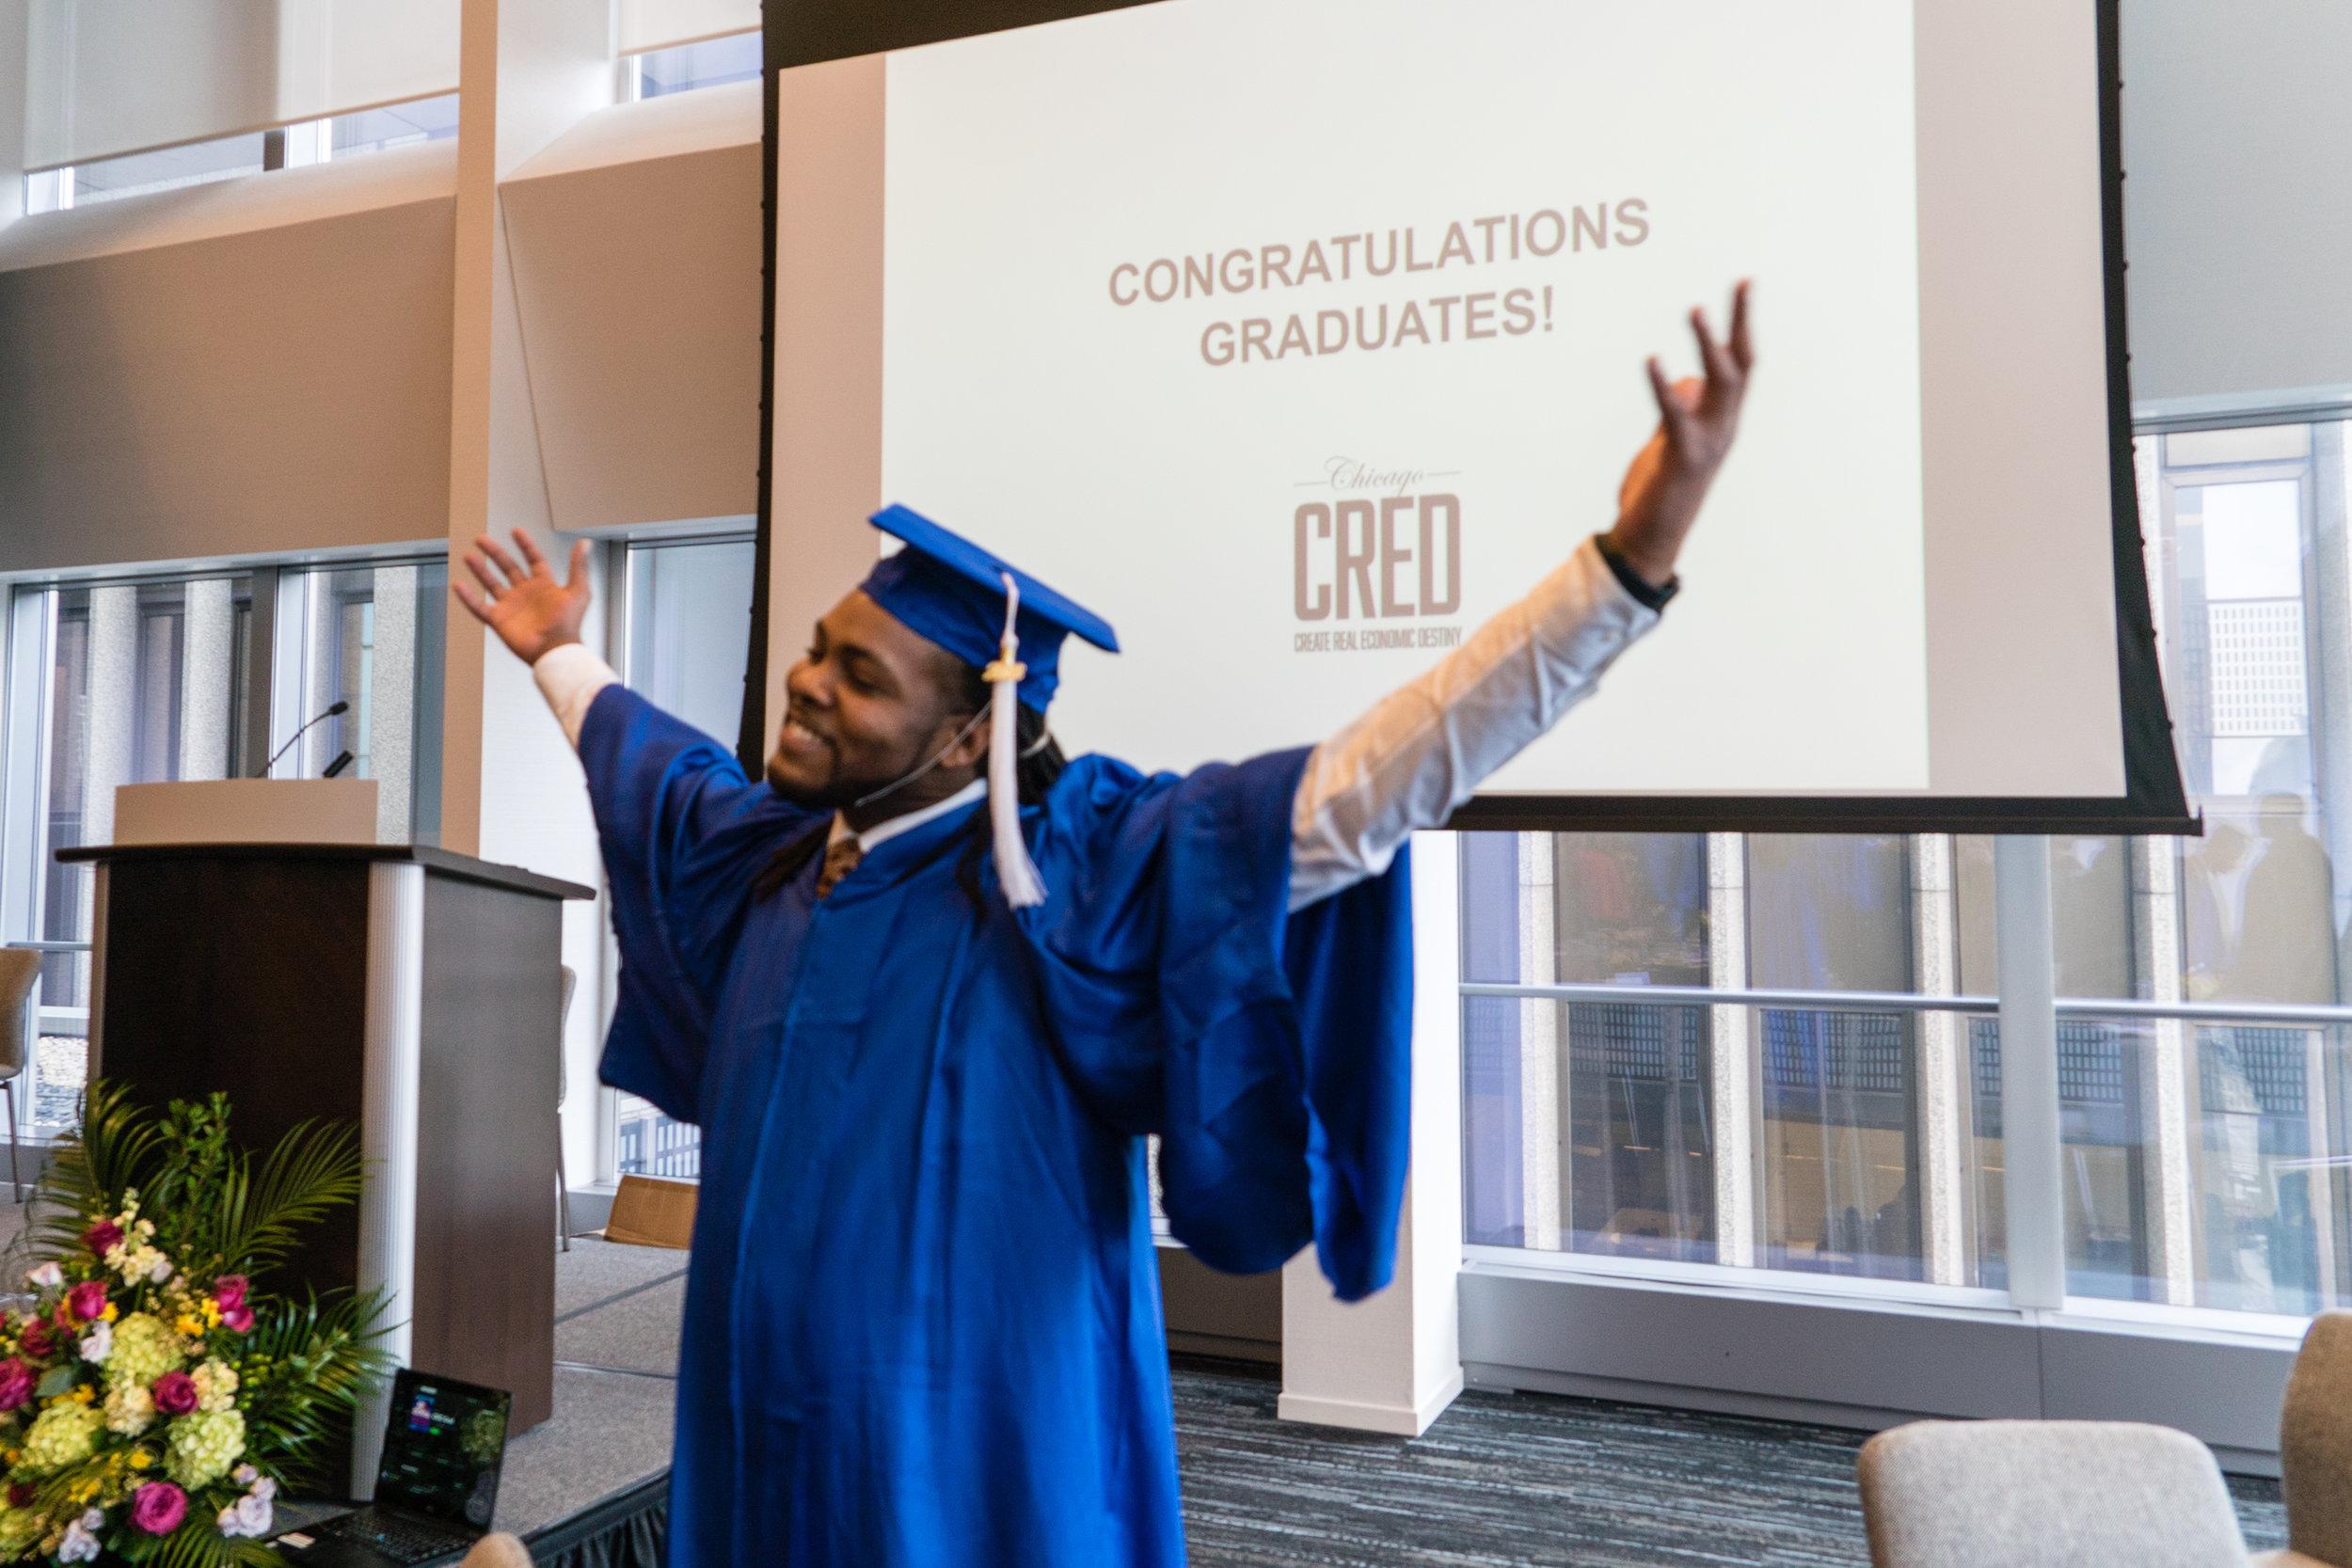 CRED_Graduation_Chicago_04062018-32.jpg